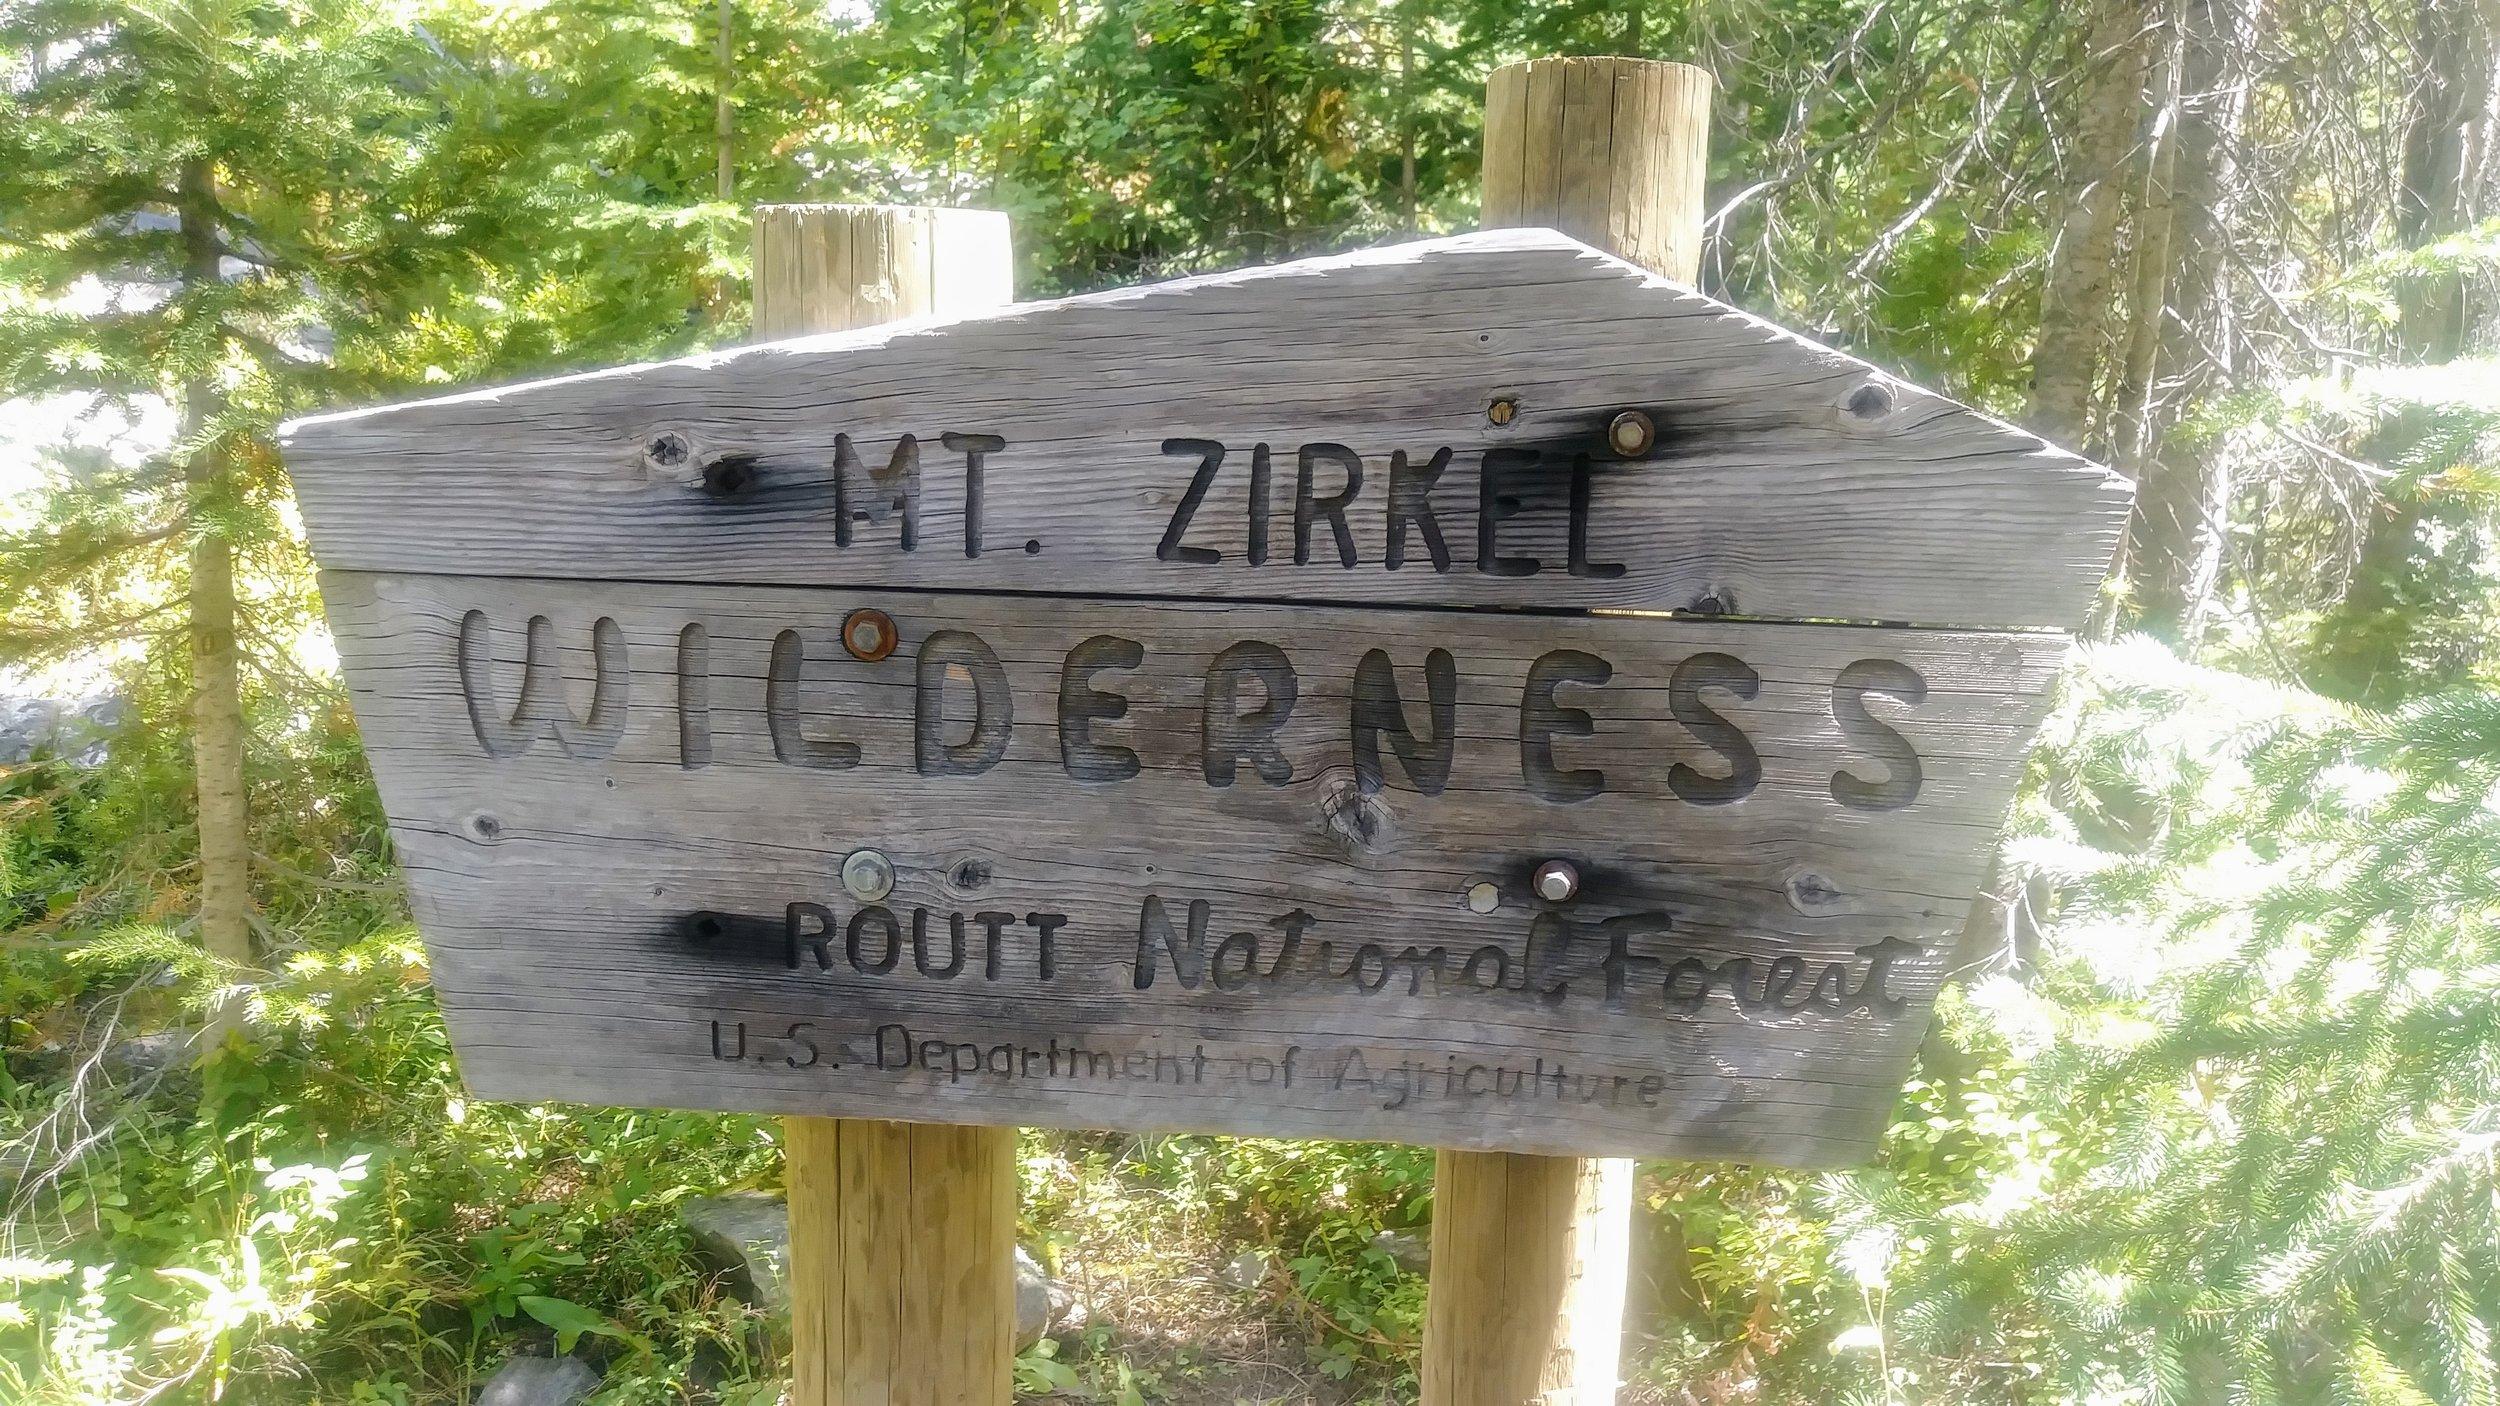 Mt. Zirkel Wilderness boundary marker in Routt National Forest